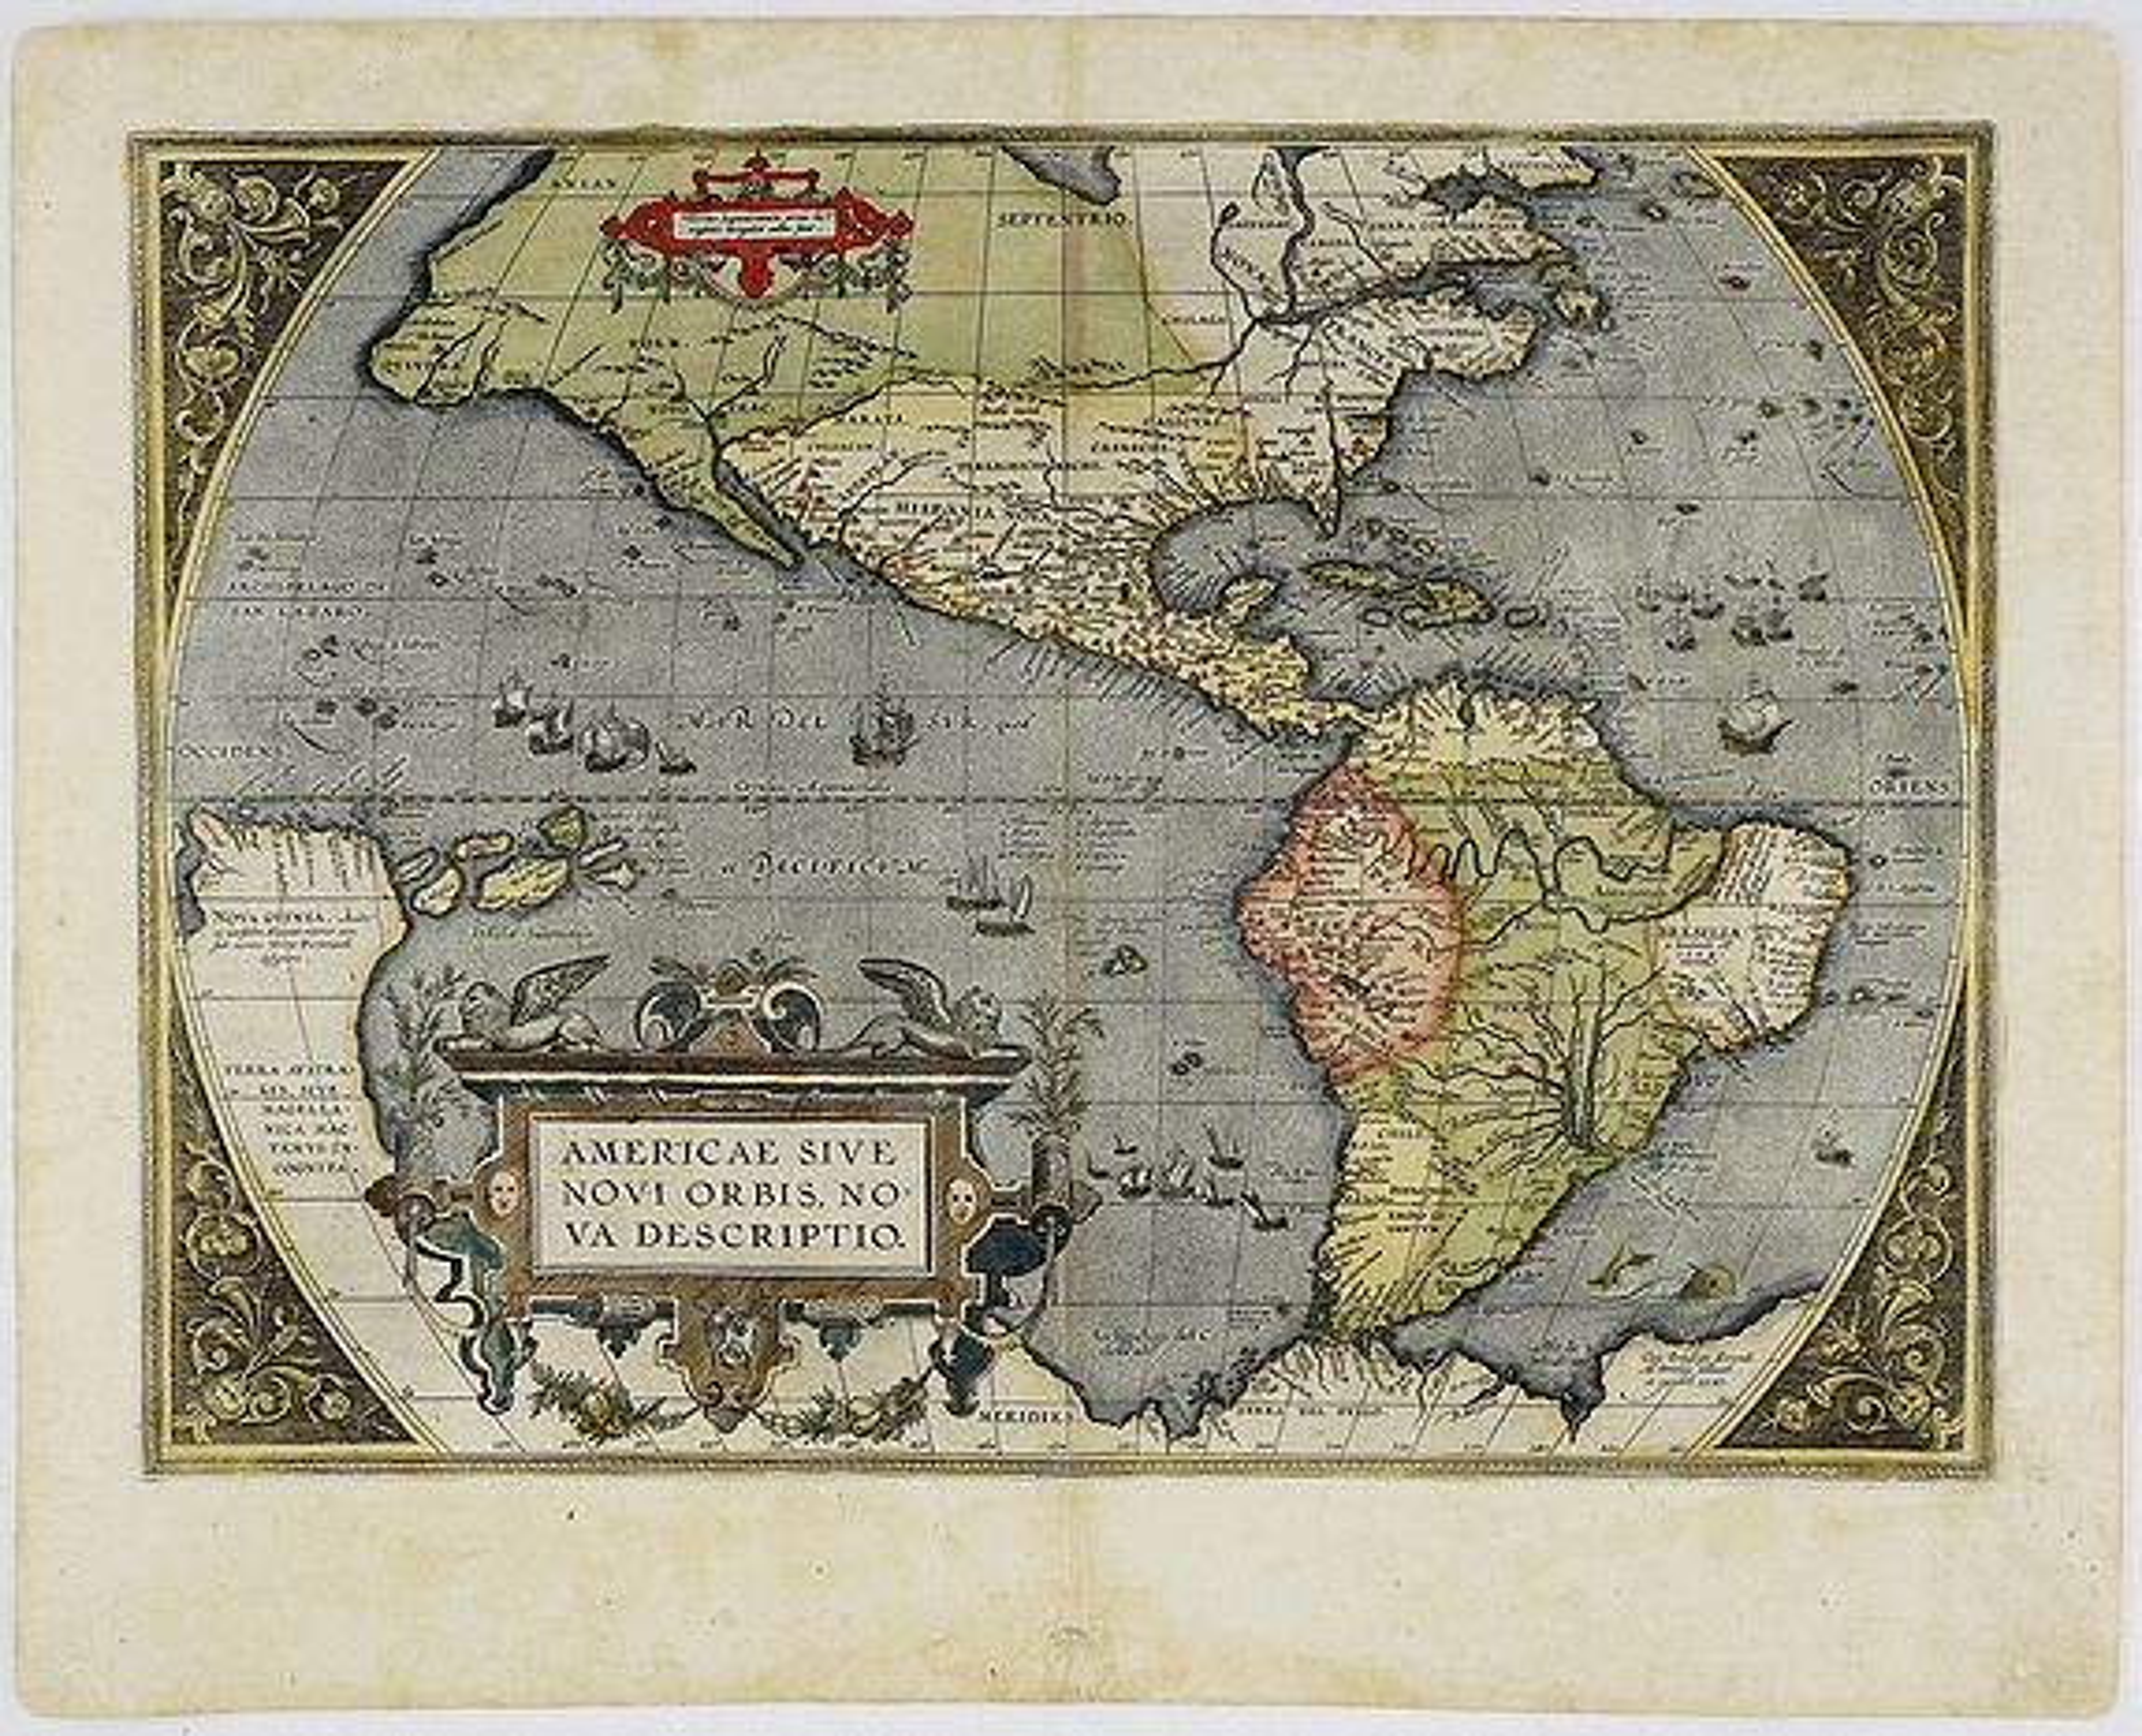 ORTELIUS, A. - Americae Sive Novi Orbis Nova Descriptio.